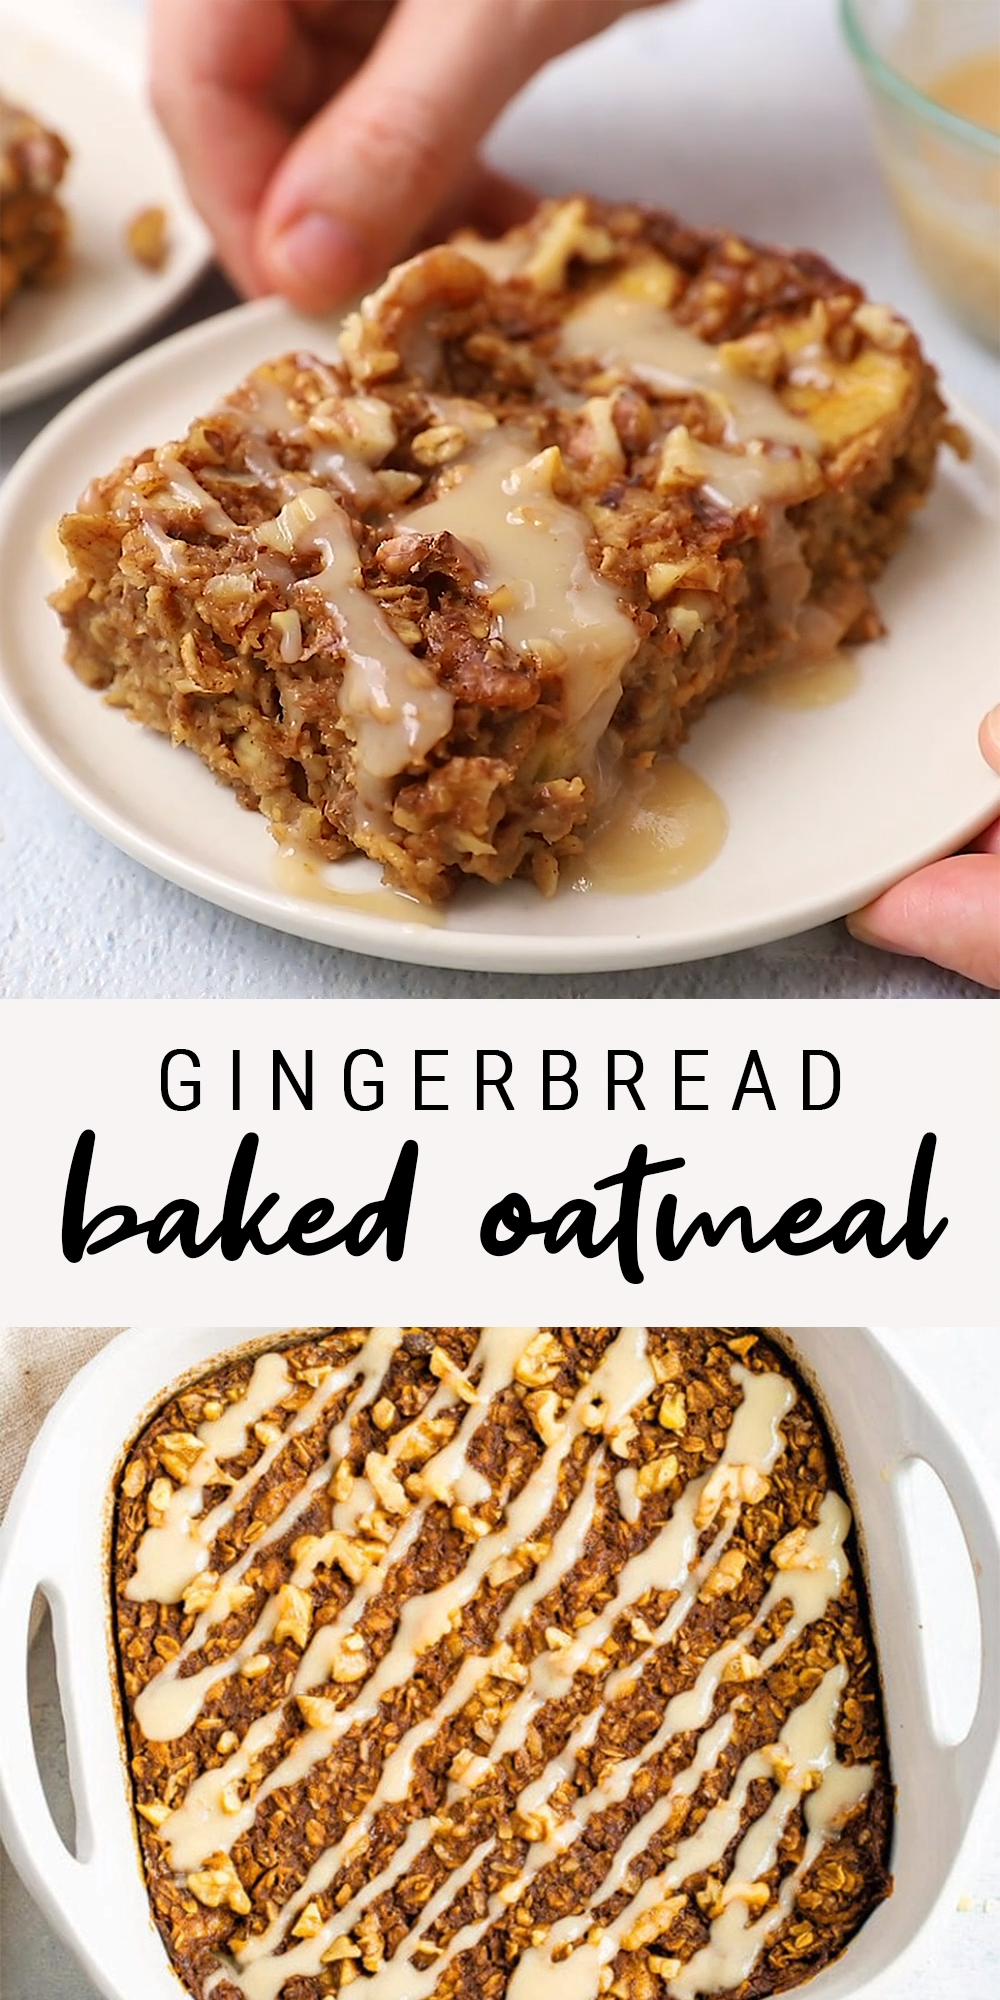 Gingerbread Baked Oatmeal   Healthy + Vegan Recipe